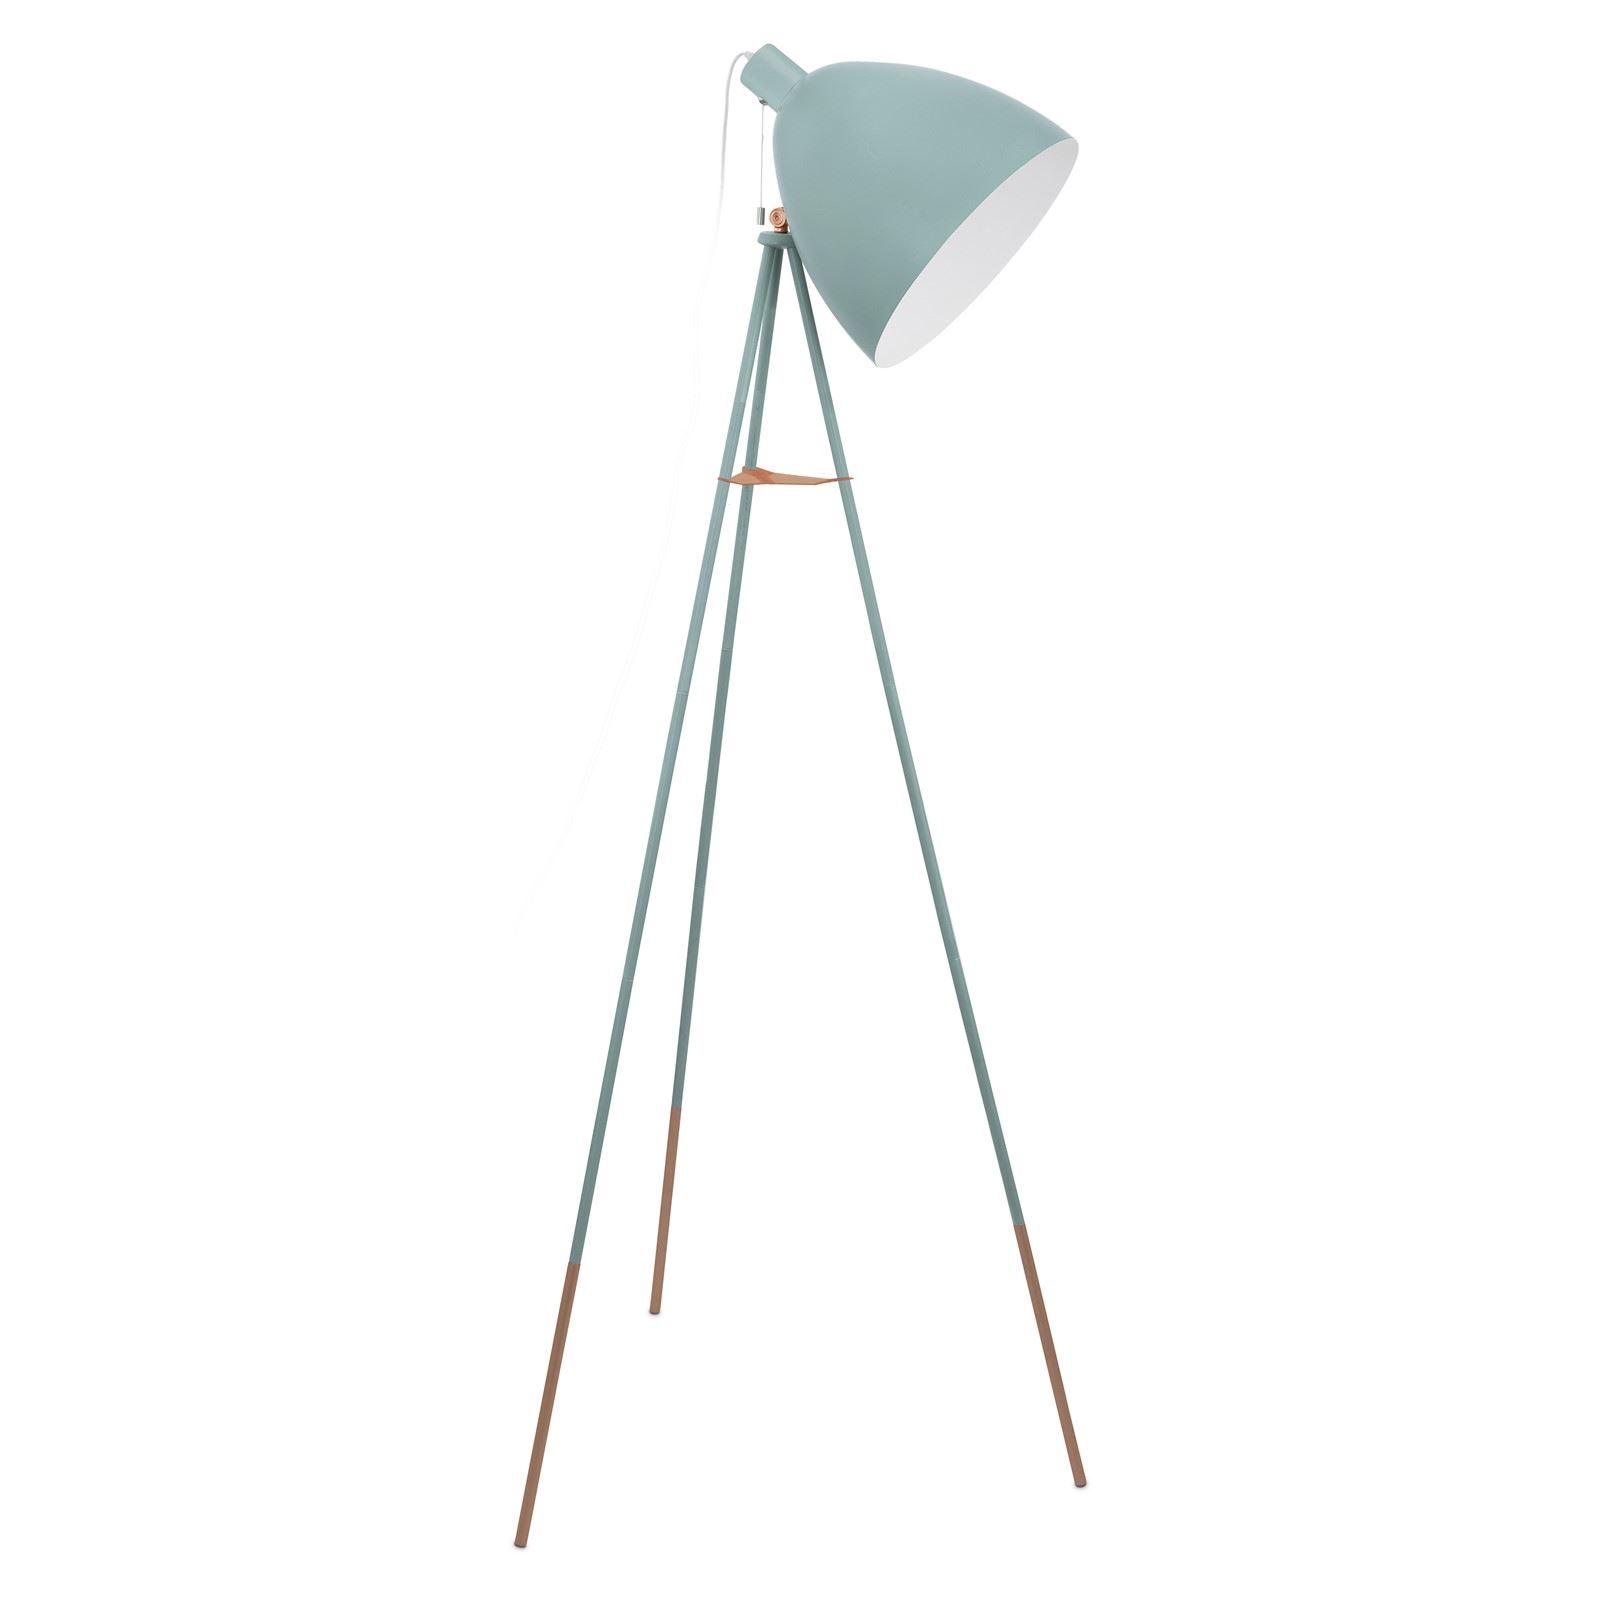 Dundee Floor Lamp Steel 1 Light E27 Mint - Modern Style Light Decor